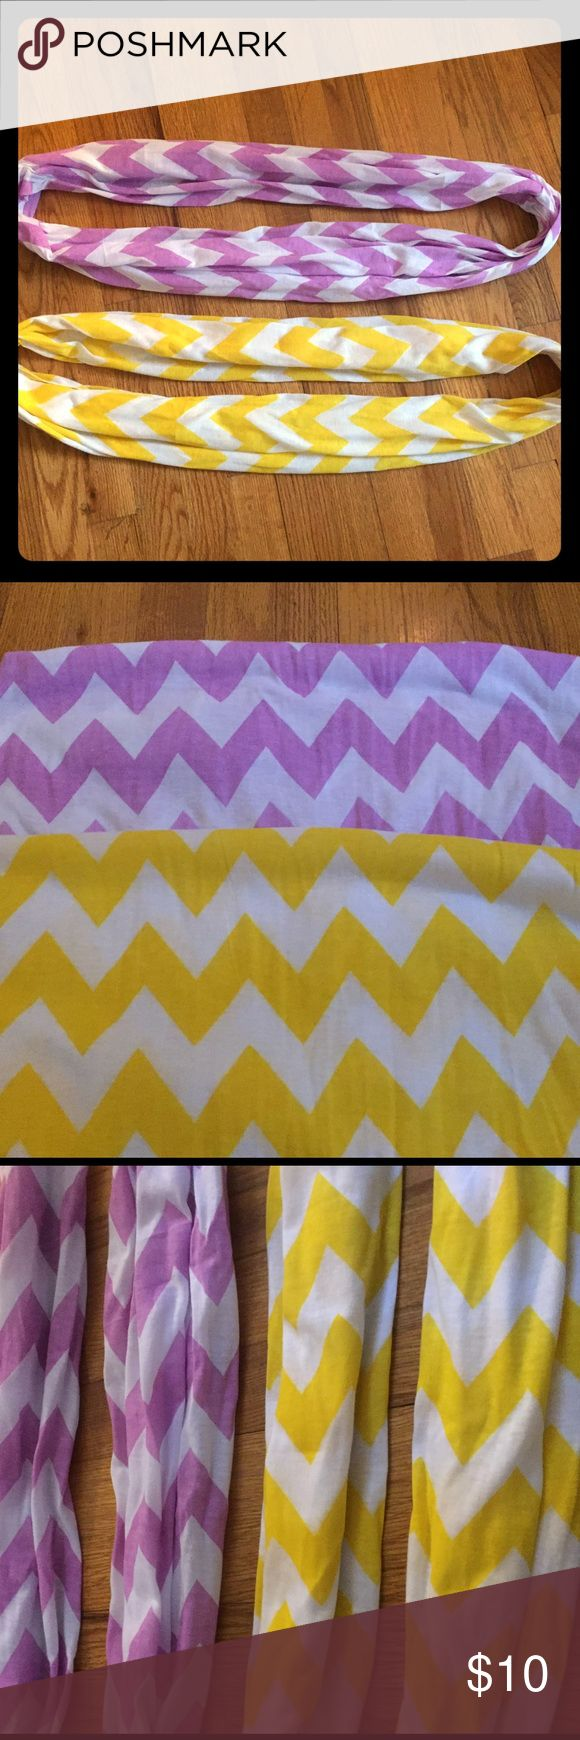 2 chevron scarves Purple/white chevron and yellow/white chevron scarves. Great condition, practically new Accessories Scarves & Wraps